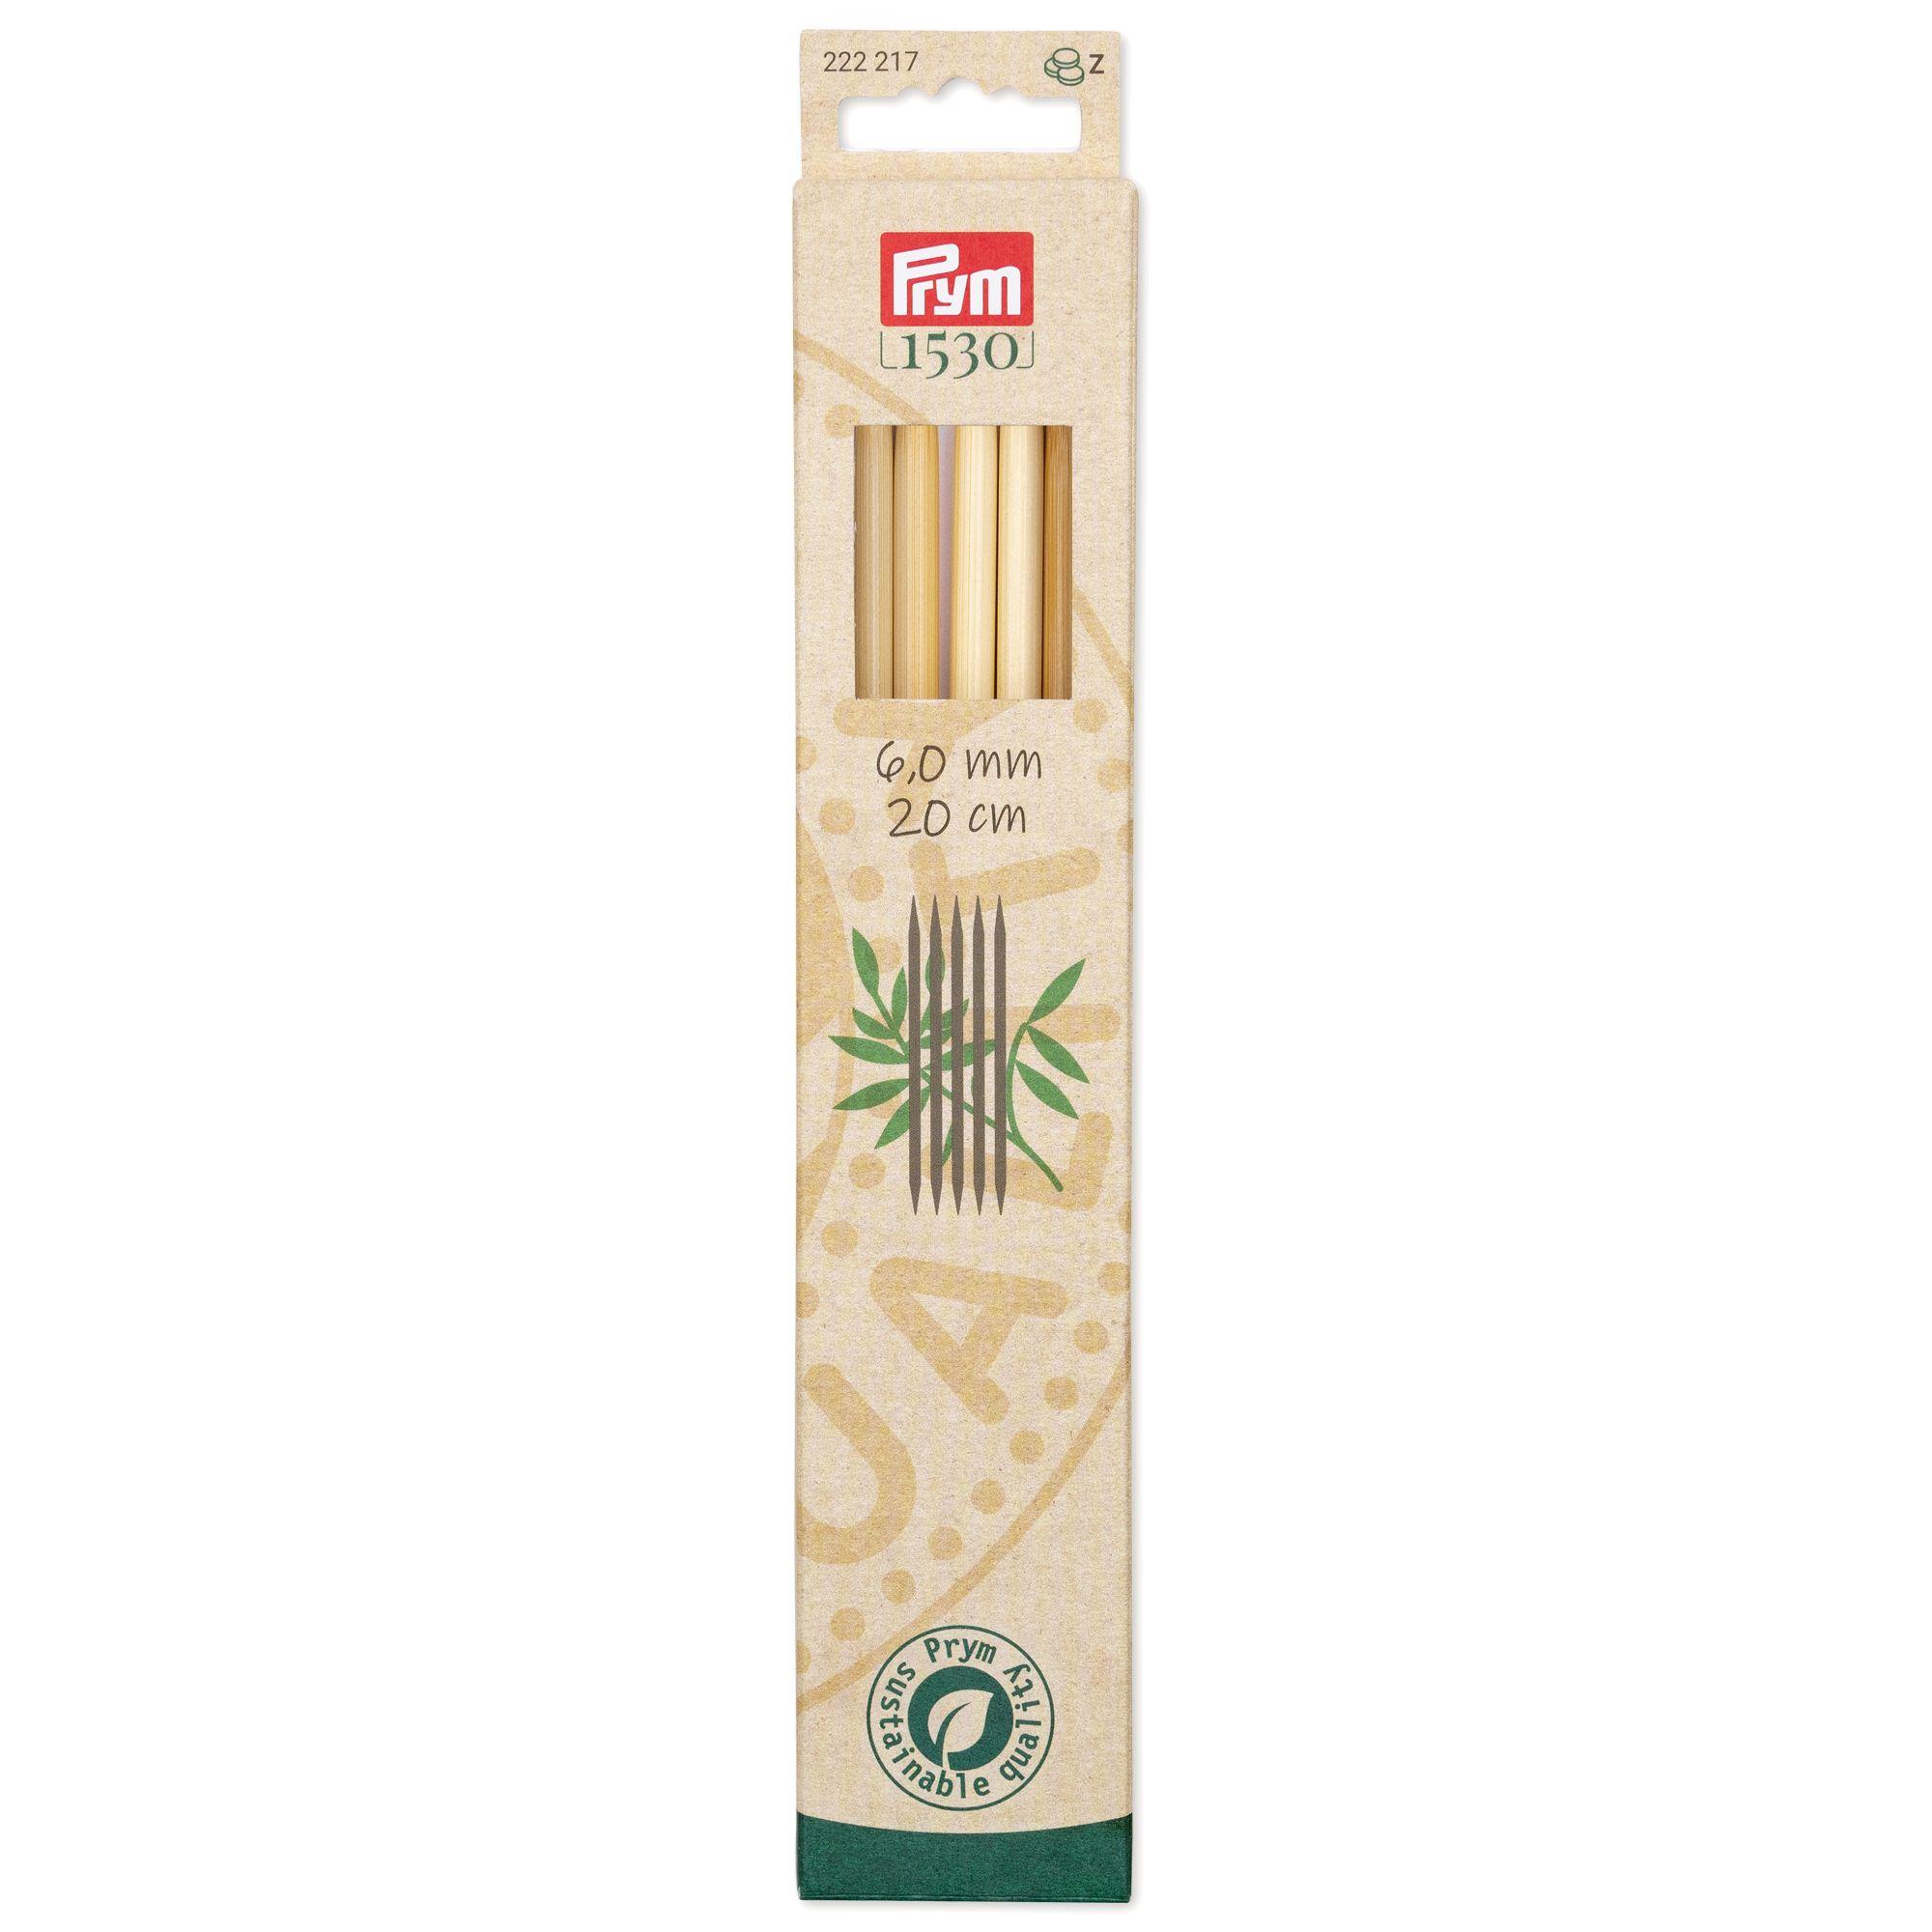 Prym 222117..222130 Strumpfstricknadeln Bambus